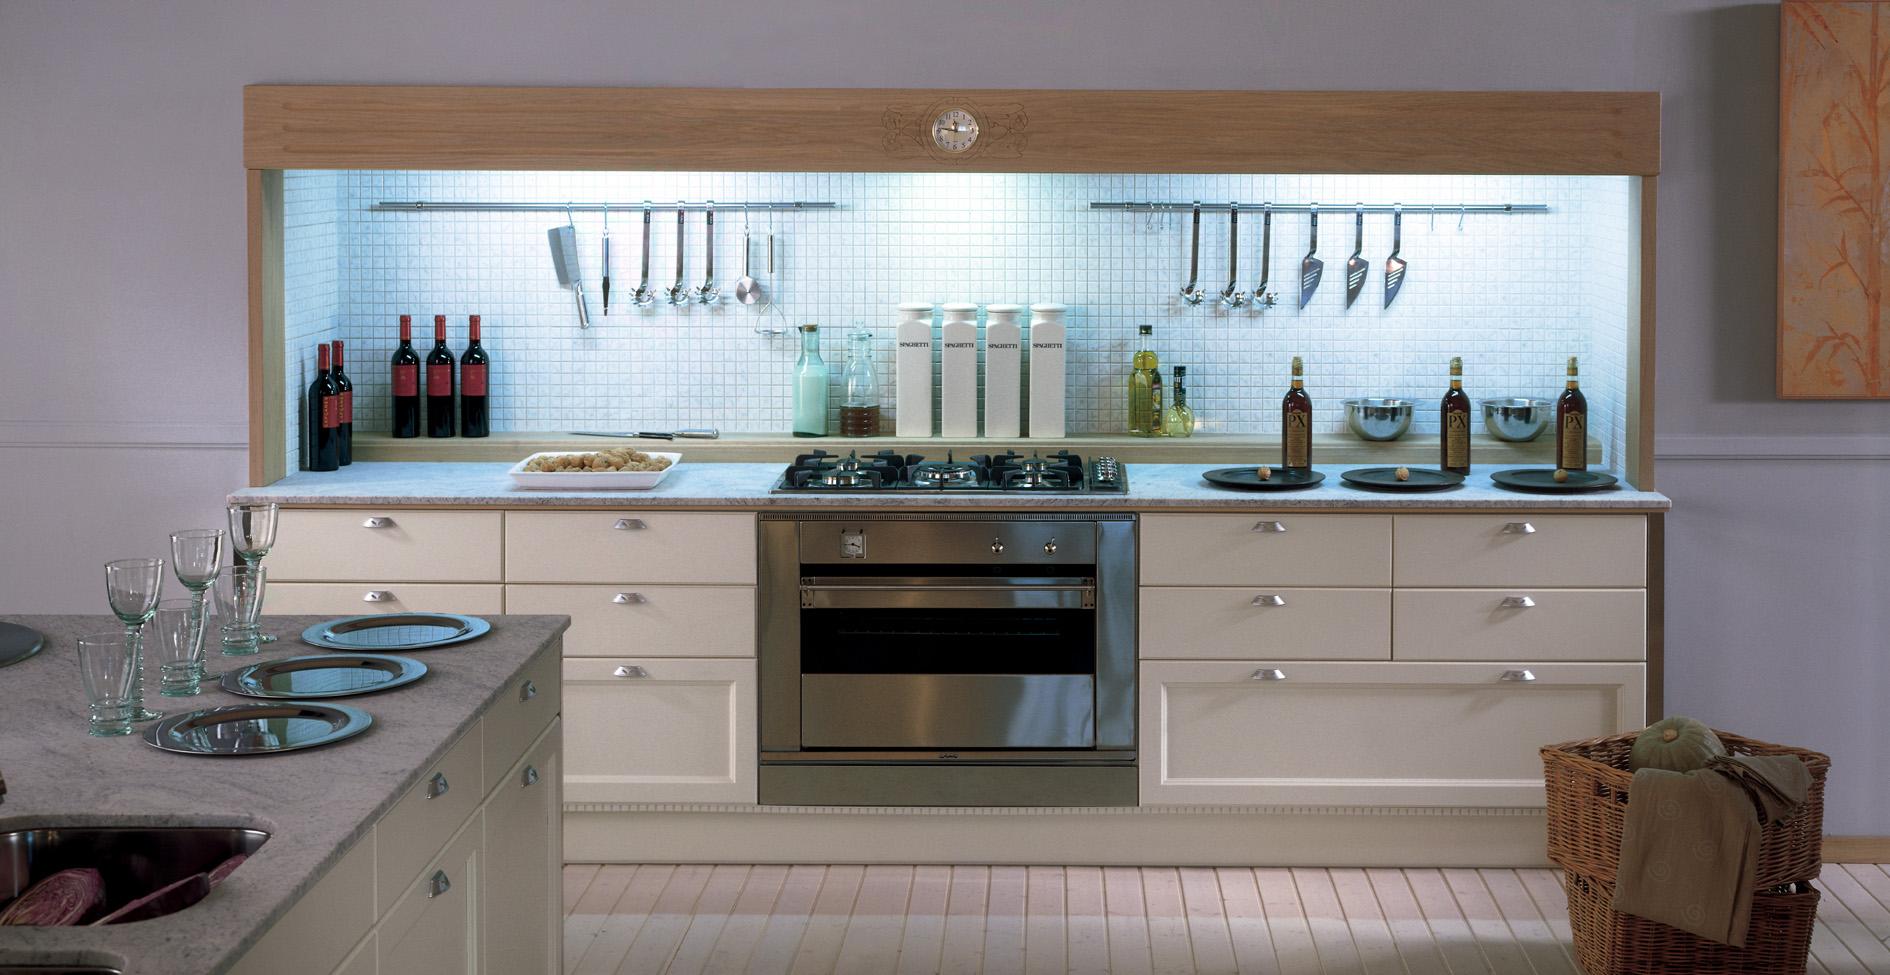 Muebles de cocina gunni trentino - Cocinas gunni trentino ...